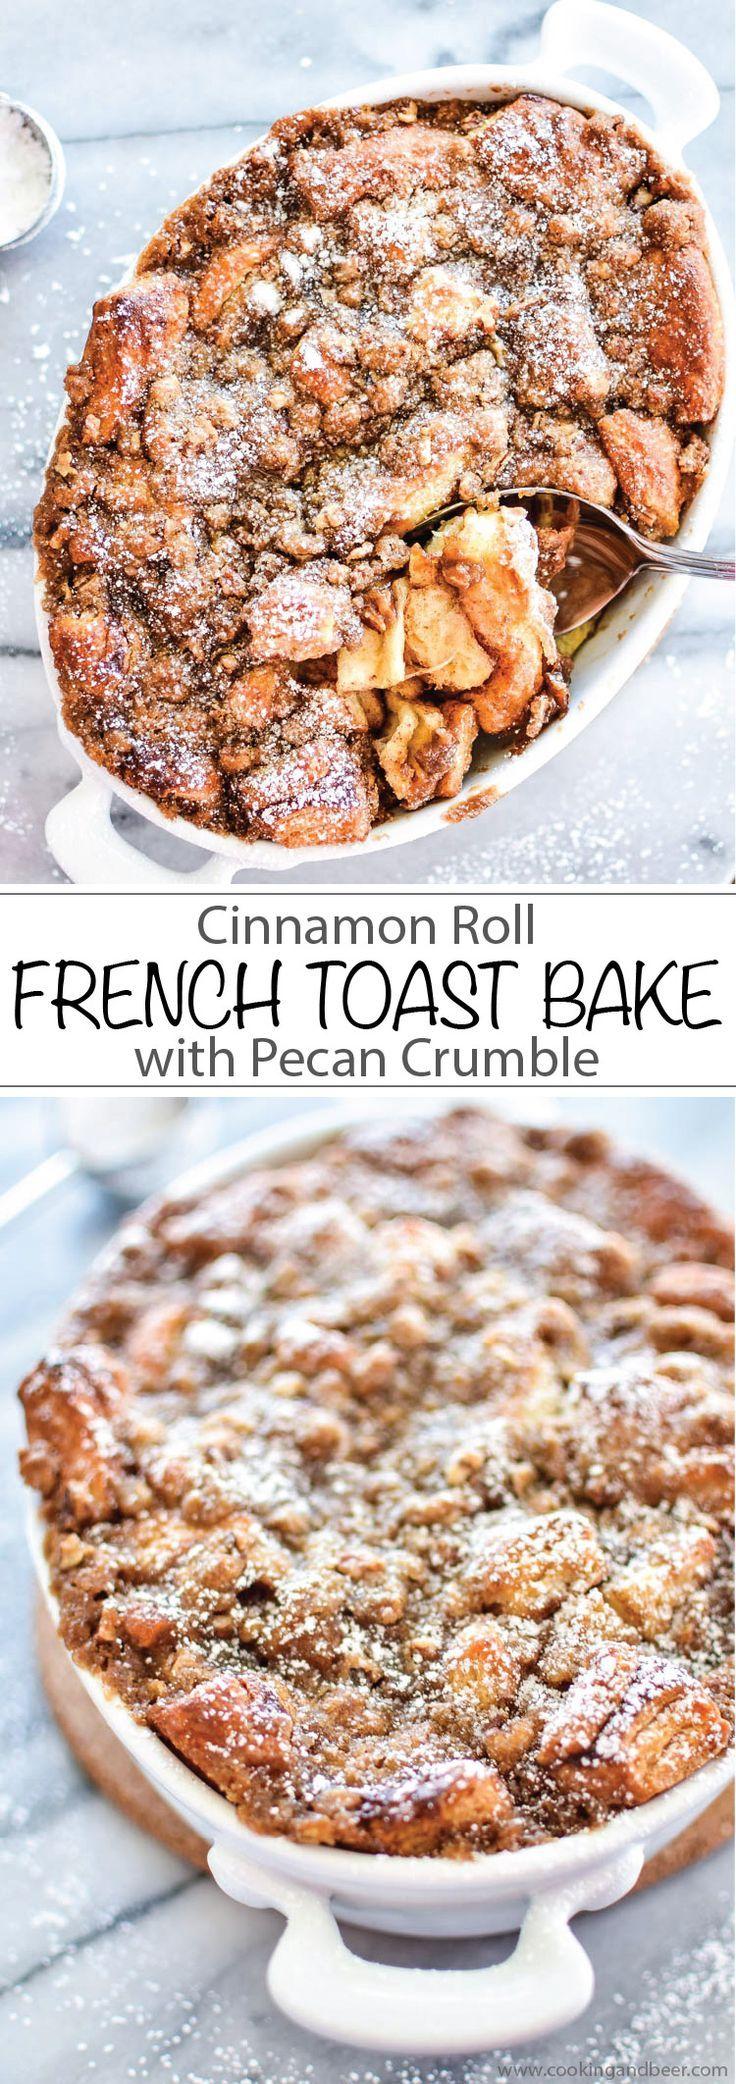 Cinnamon Roll French Toast Bake with Pecan Crumble #breakfast #breakfastideas   www.cookingandbeer.com